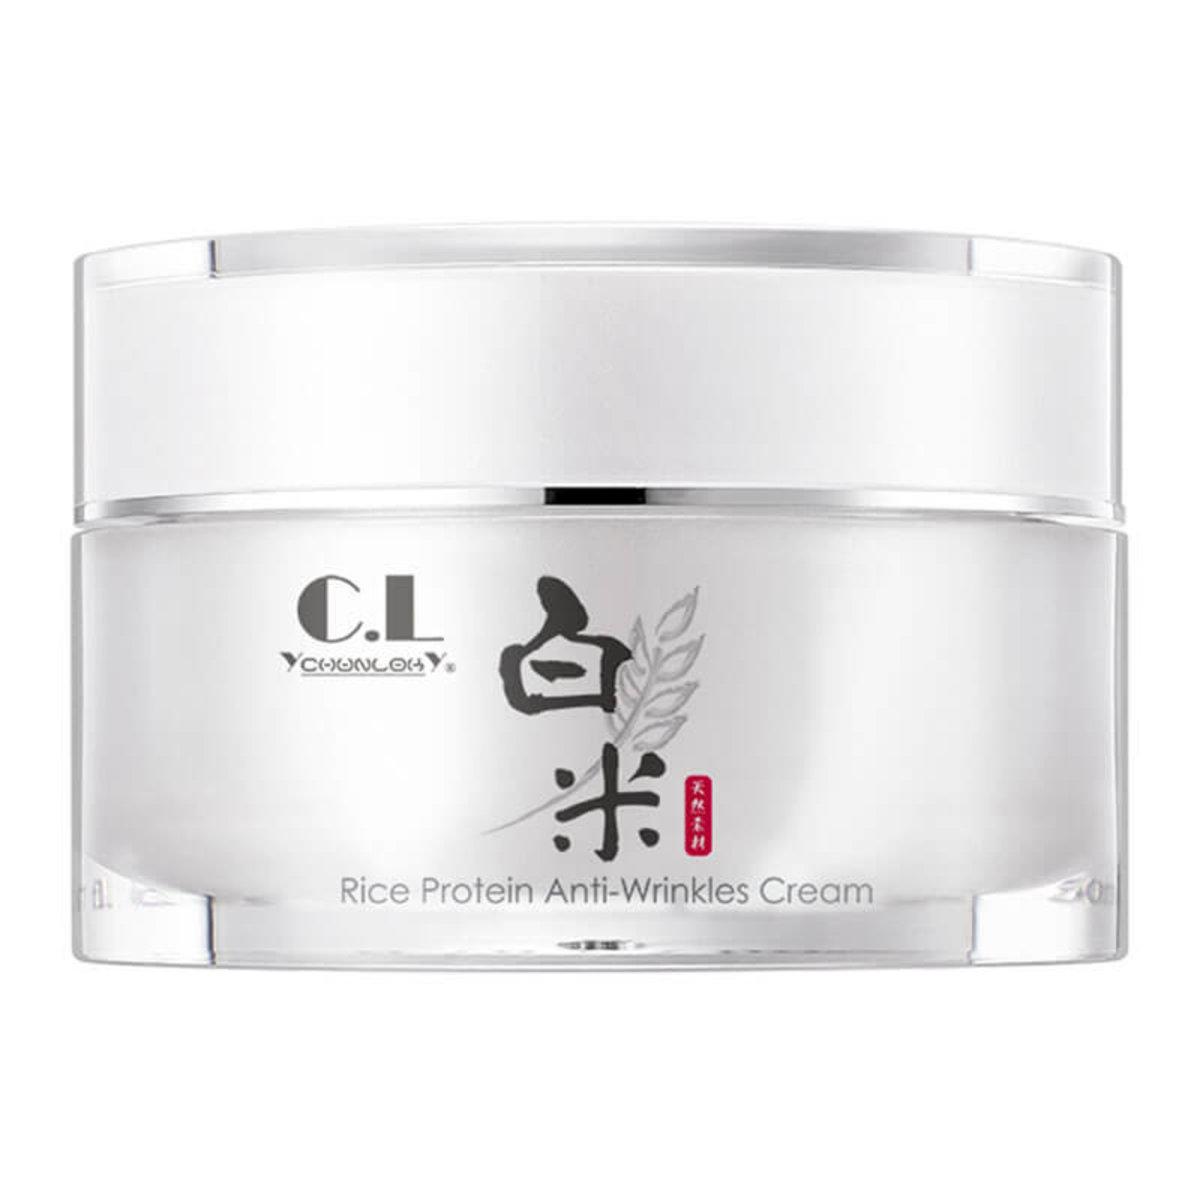 Rice Protein Anti-Wrinkles Cream